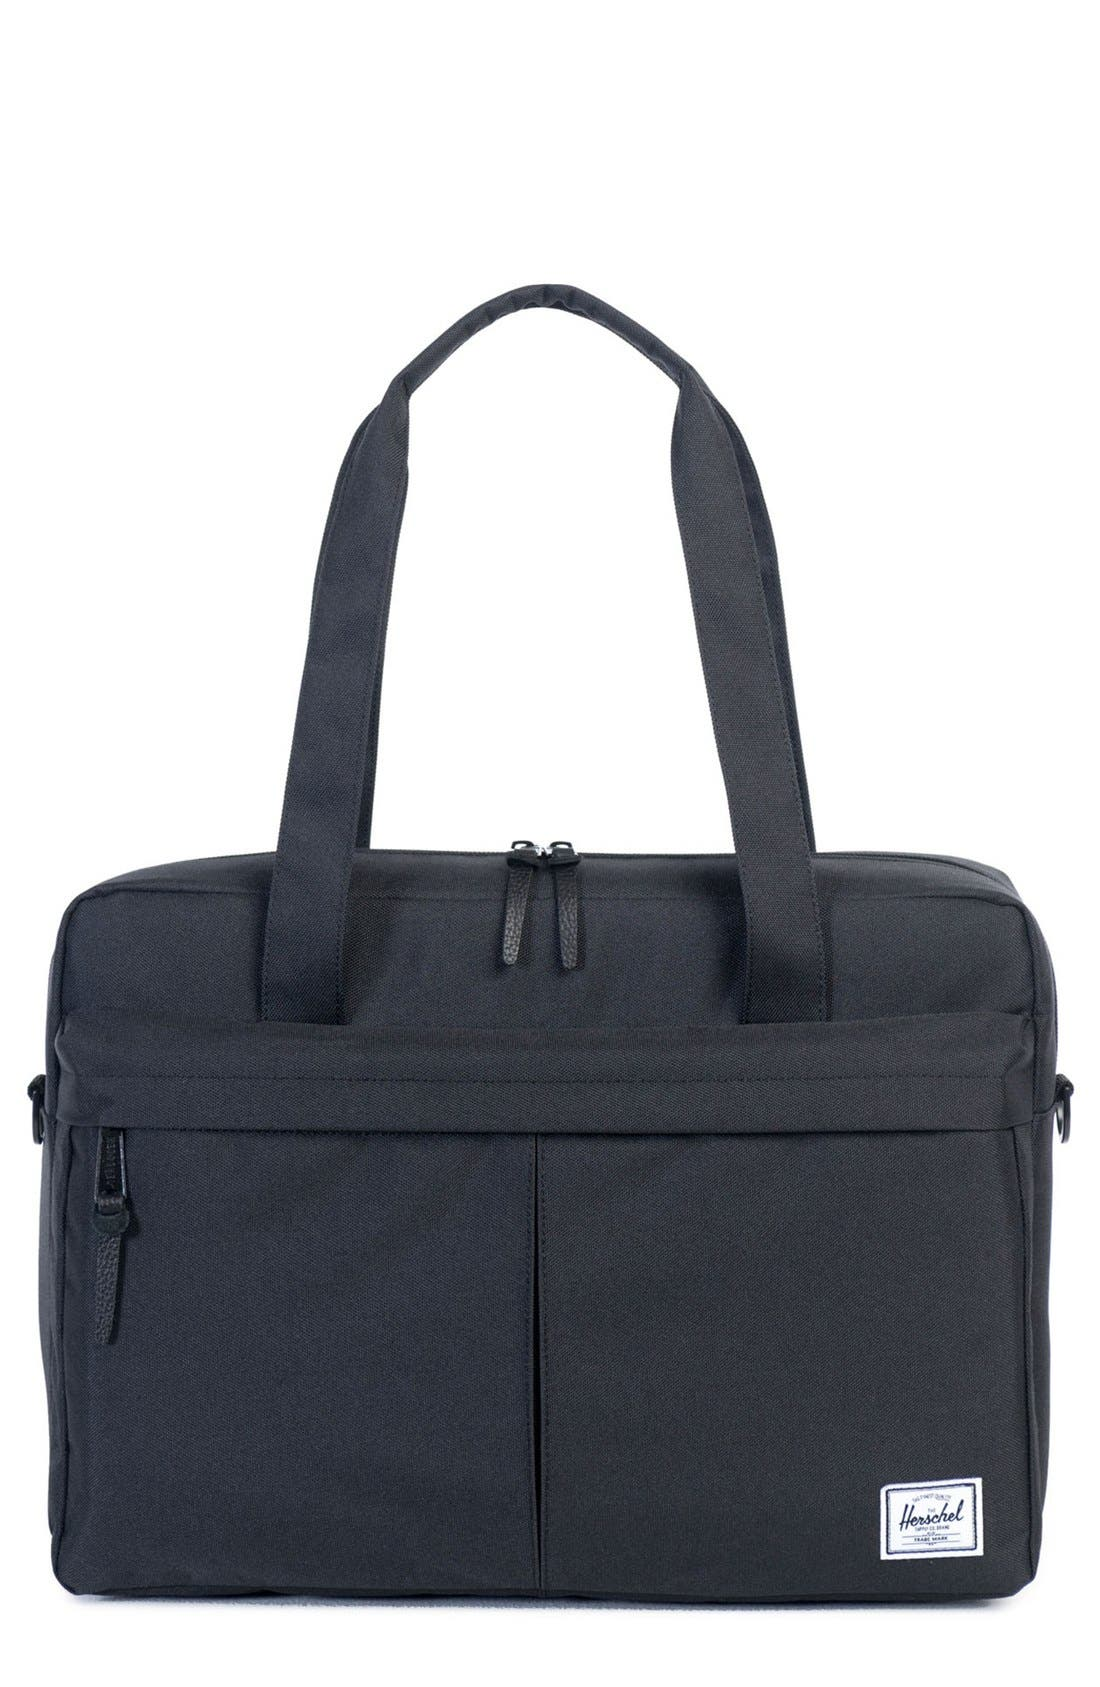 'Gibson' Messenger Bag,                             Main thumbnail 1, color,                             001